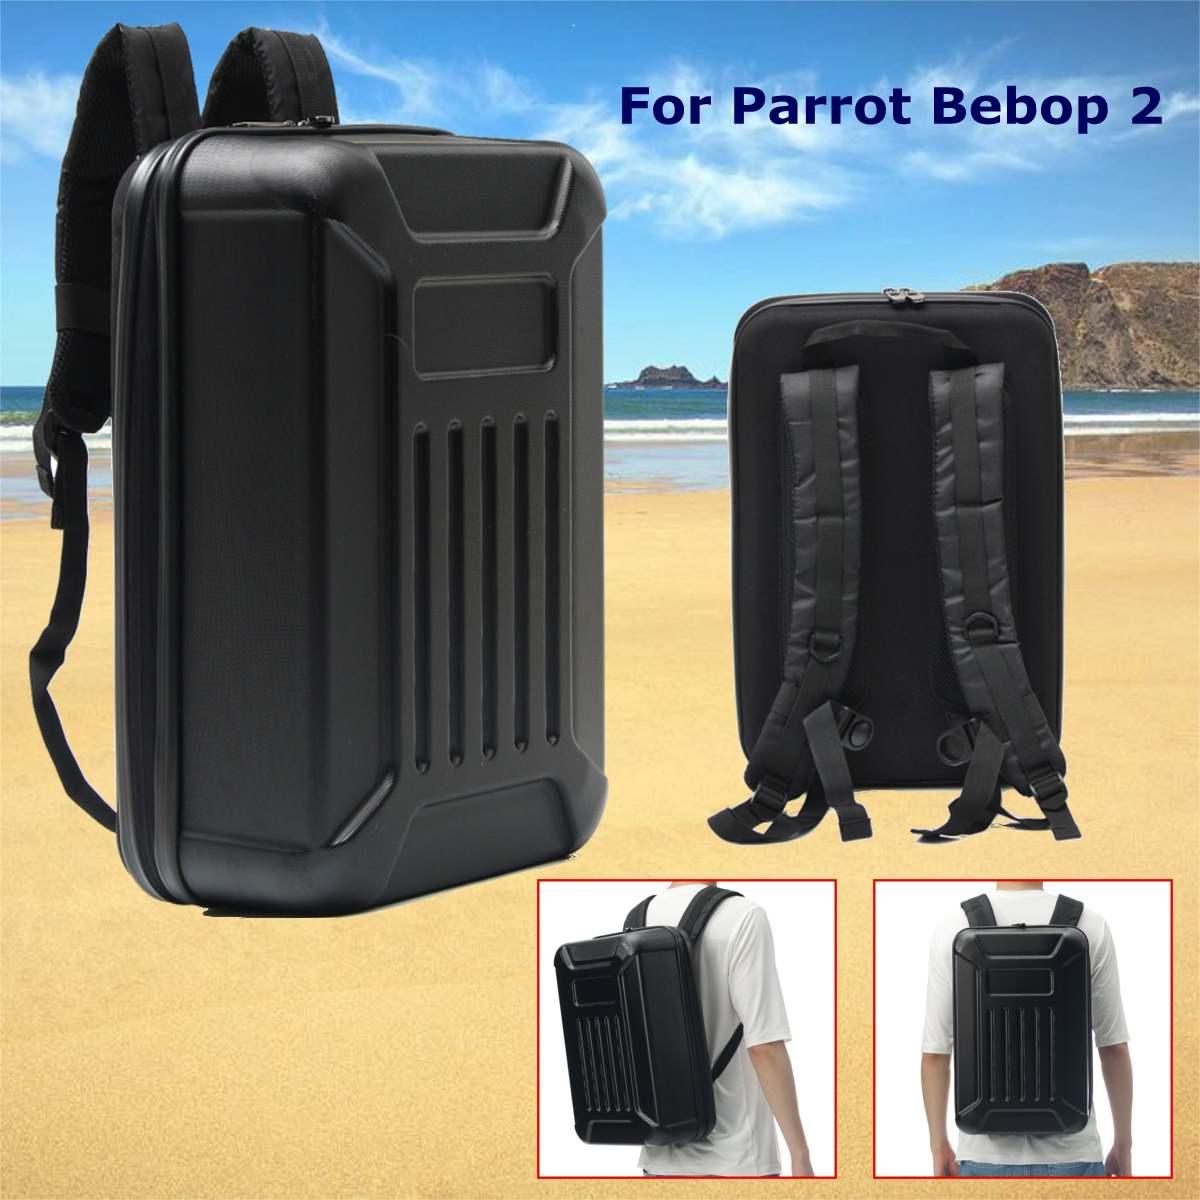 Coque rigide sac à dos boite de protection Portable pour perroquet Bebop 2 Drone utile